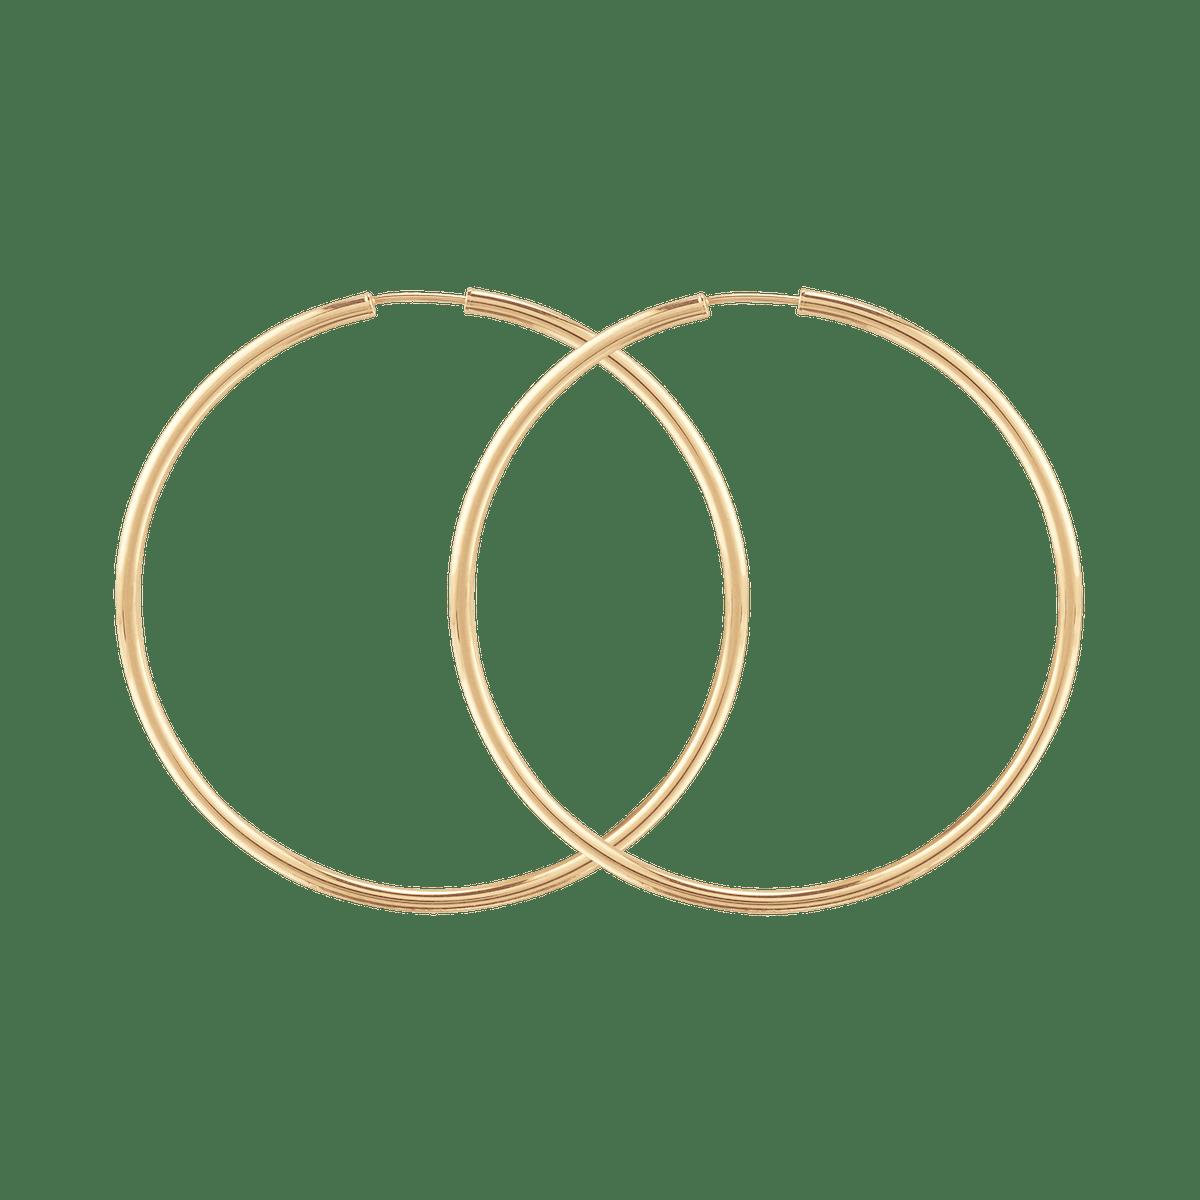 Oversized Thin Hoops